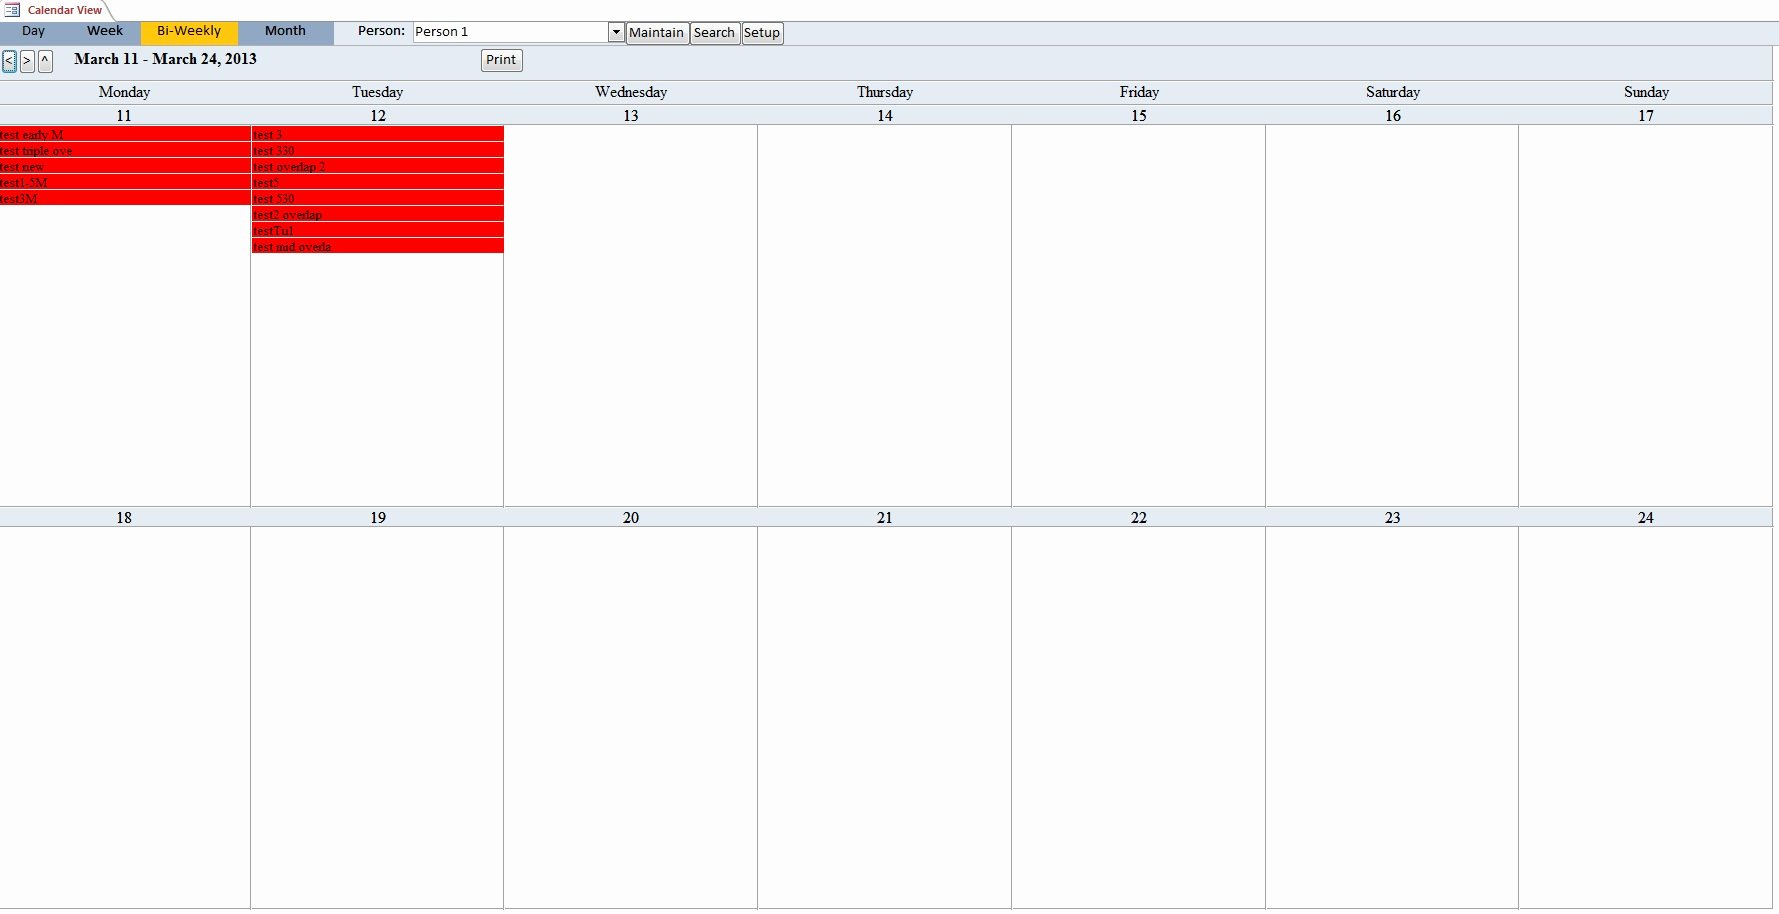 Microsoft Access Scheduling Template New Kalender 2019 Mit Feiertagen